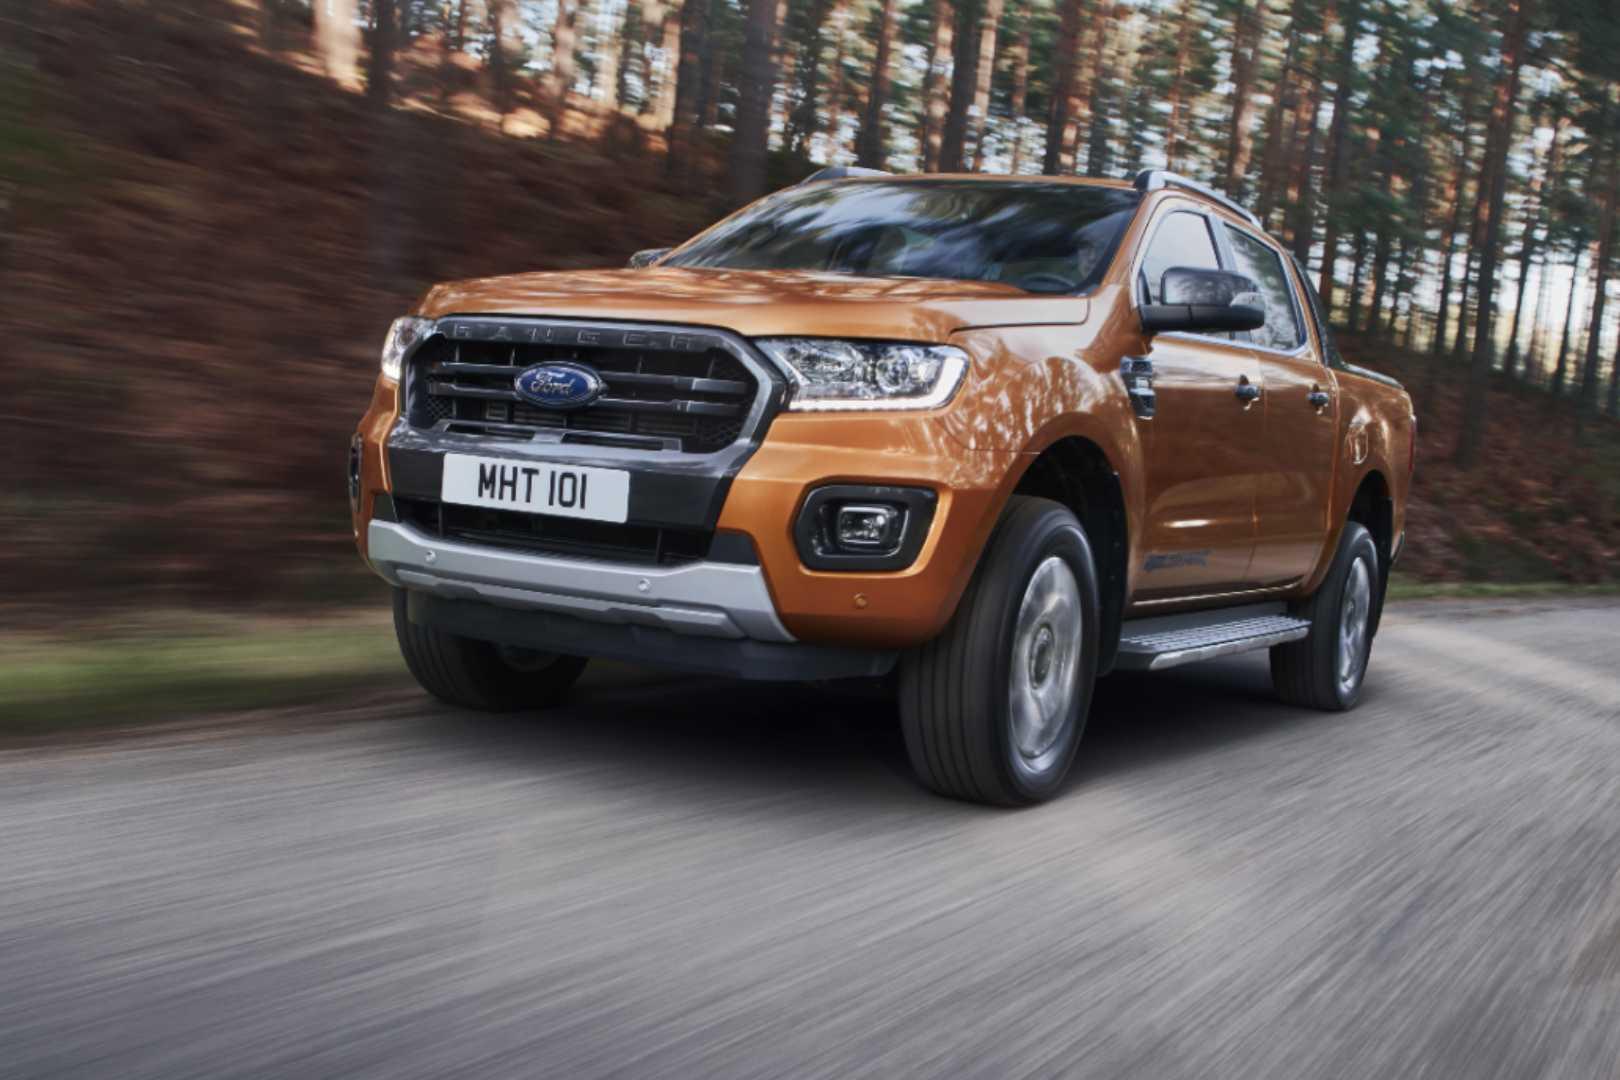 Ford Ranger Wildtrak Pick up